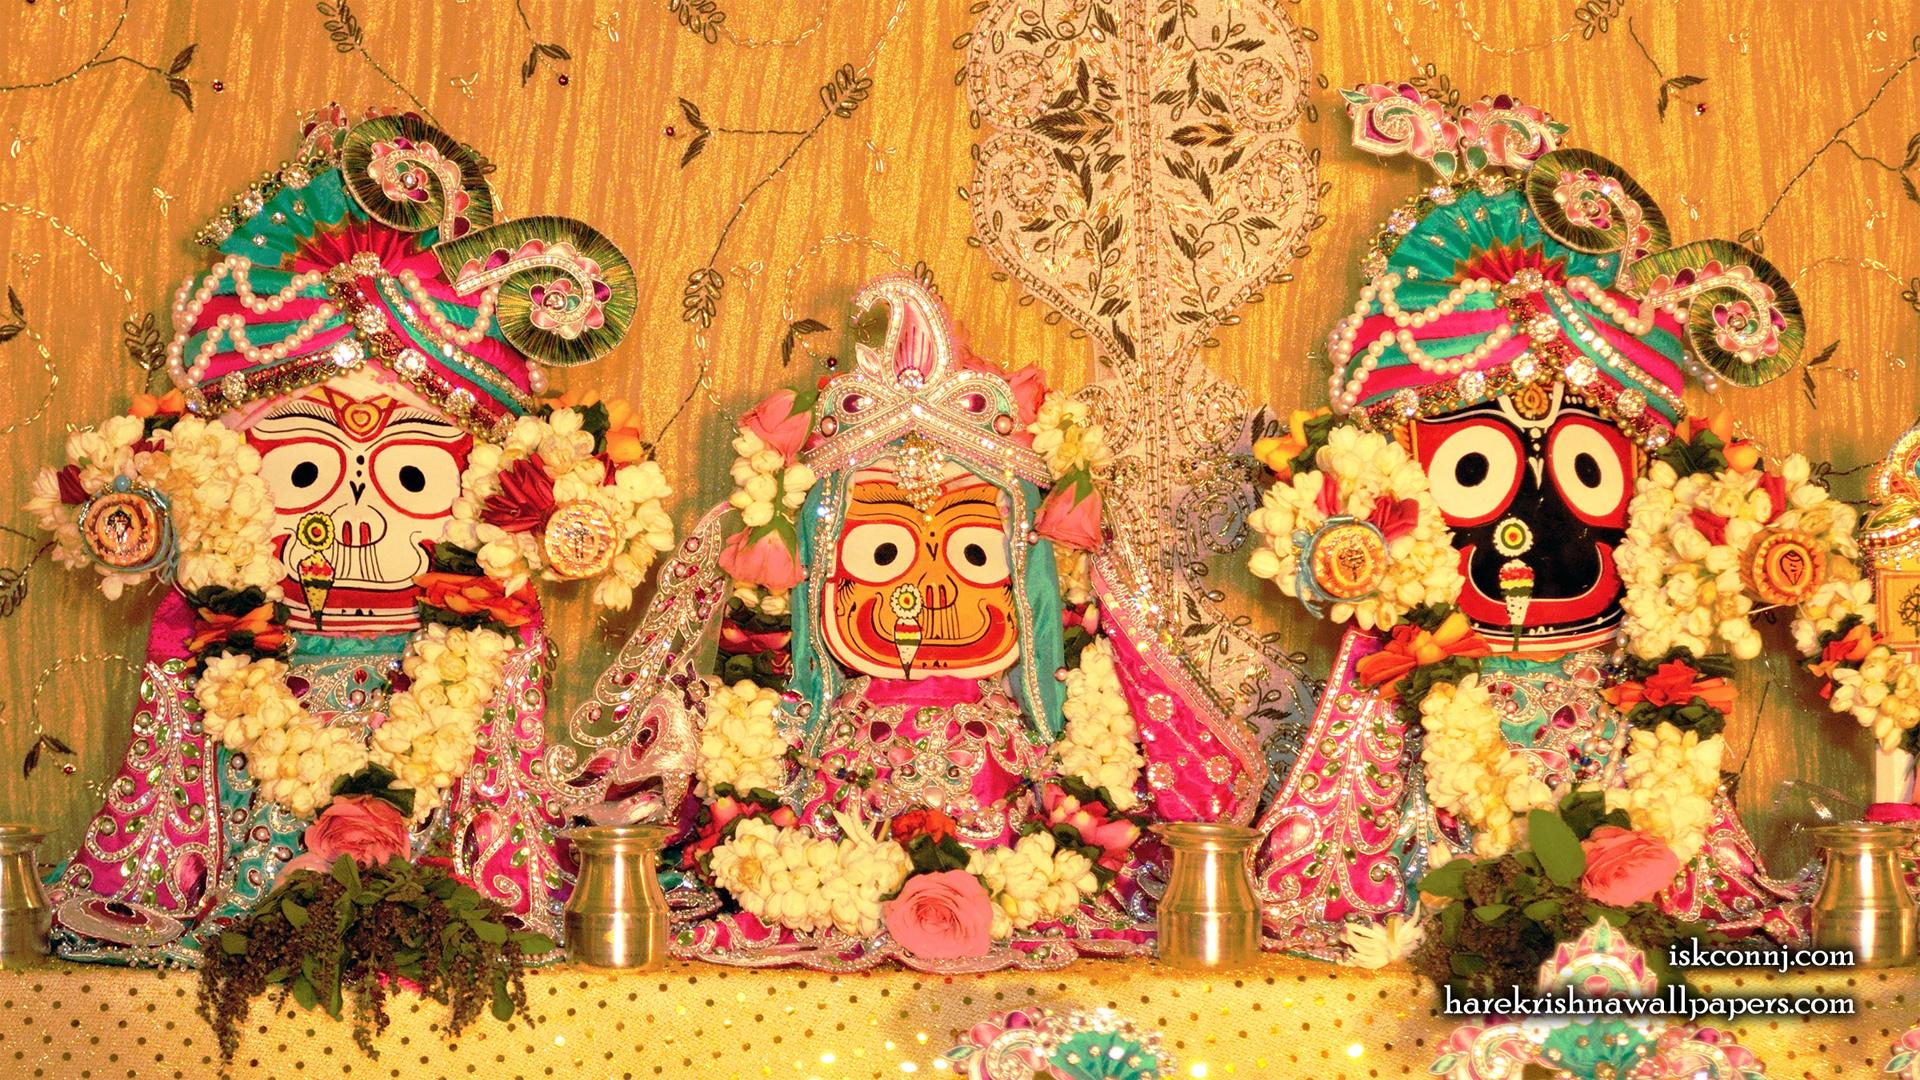 Jagannath Baladeva Subhadra Wallpaper (008) Size 1920x1080 Download